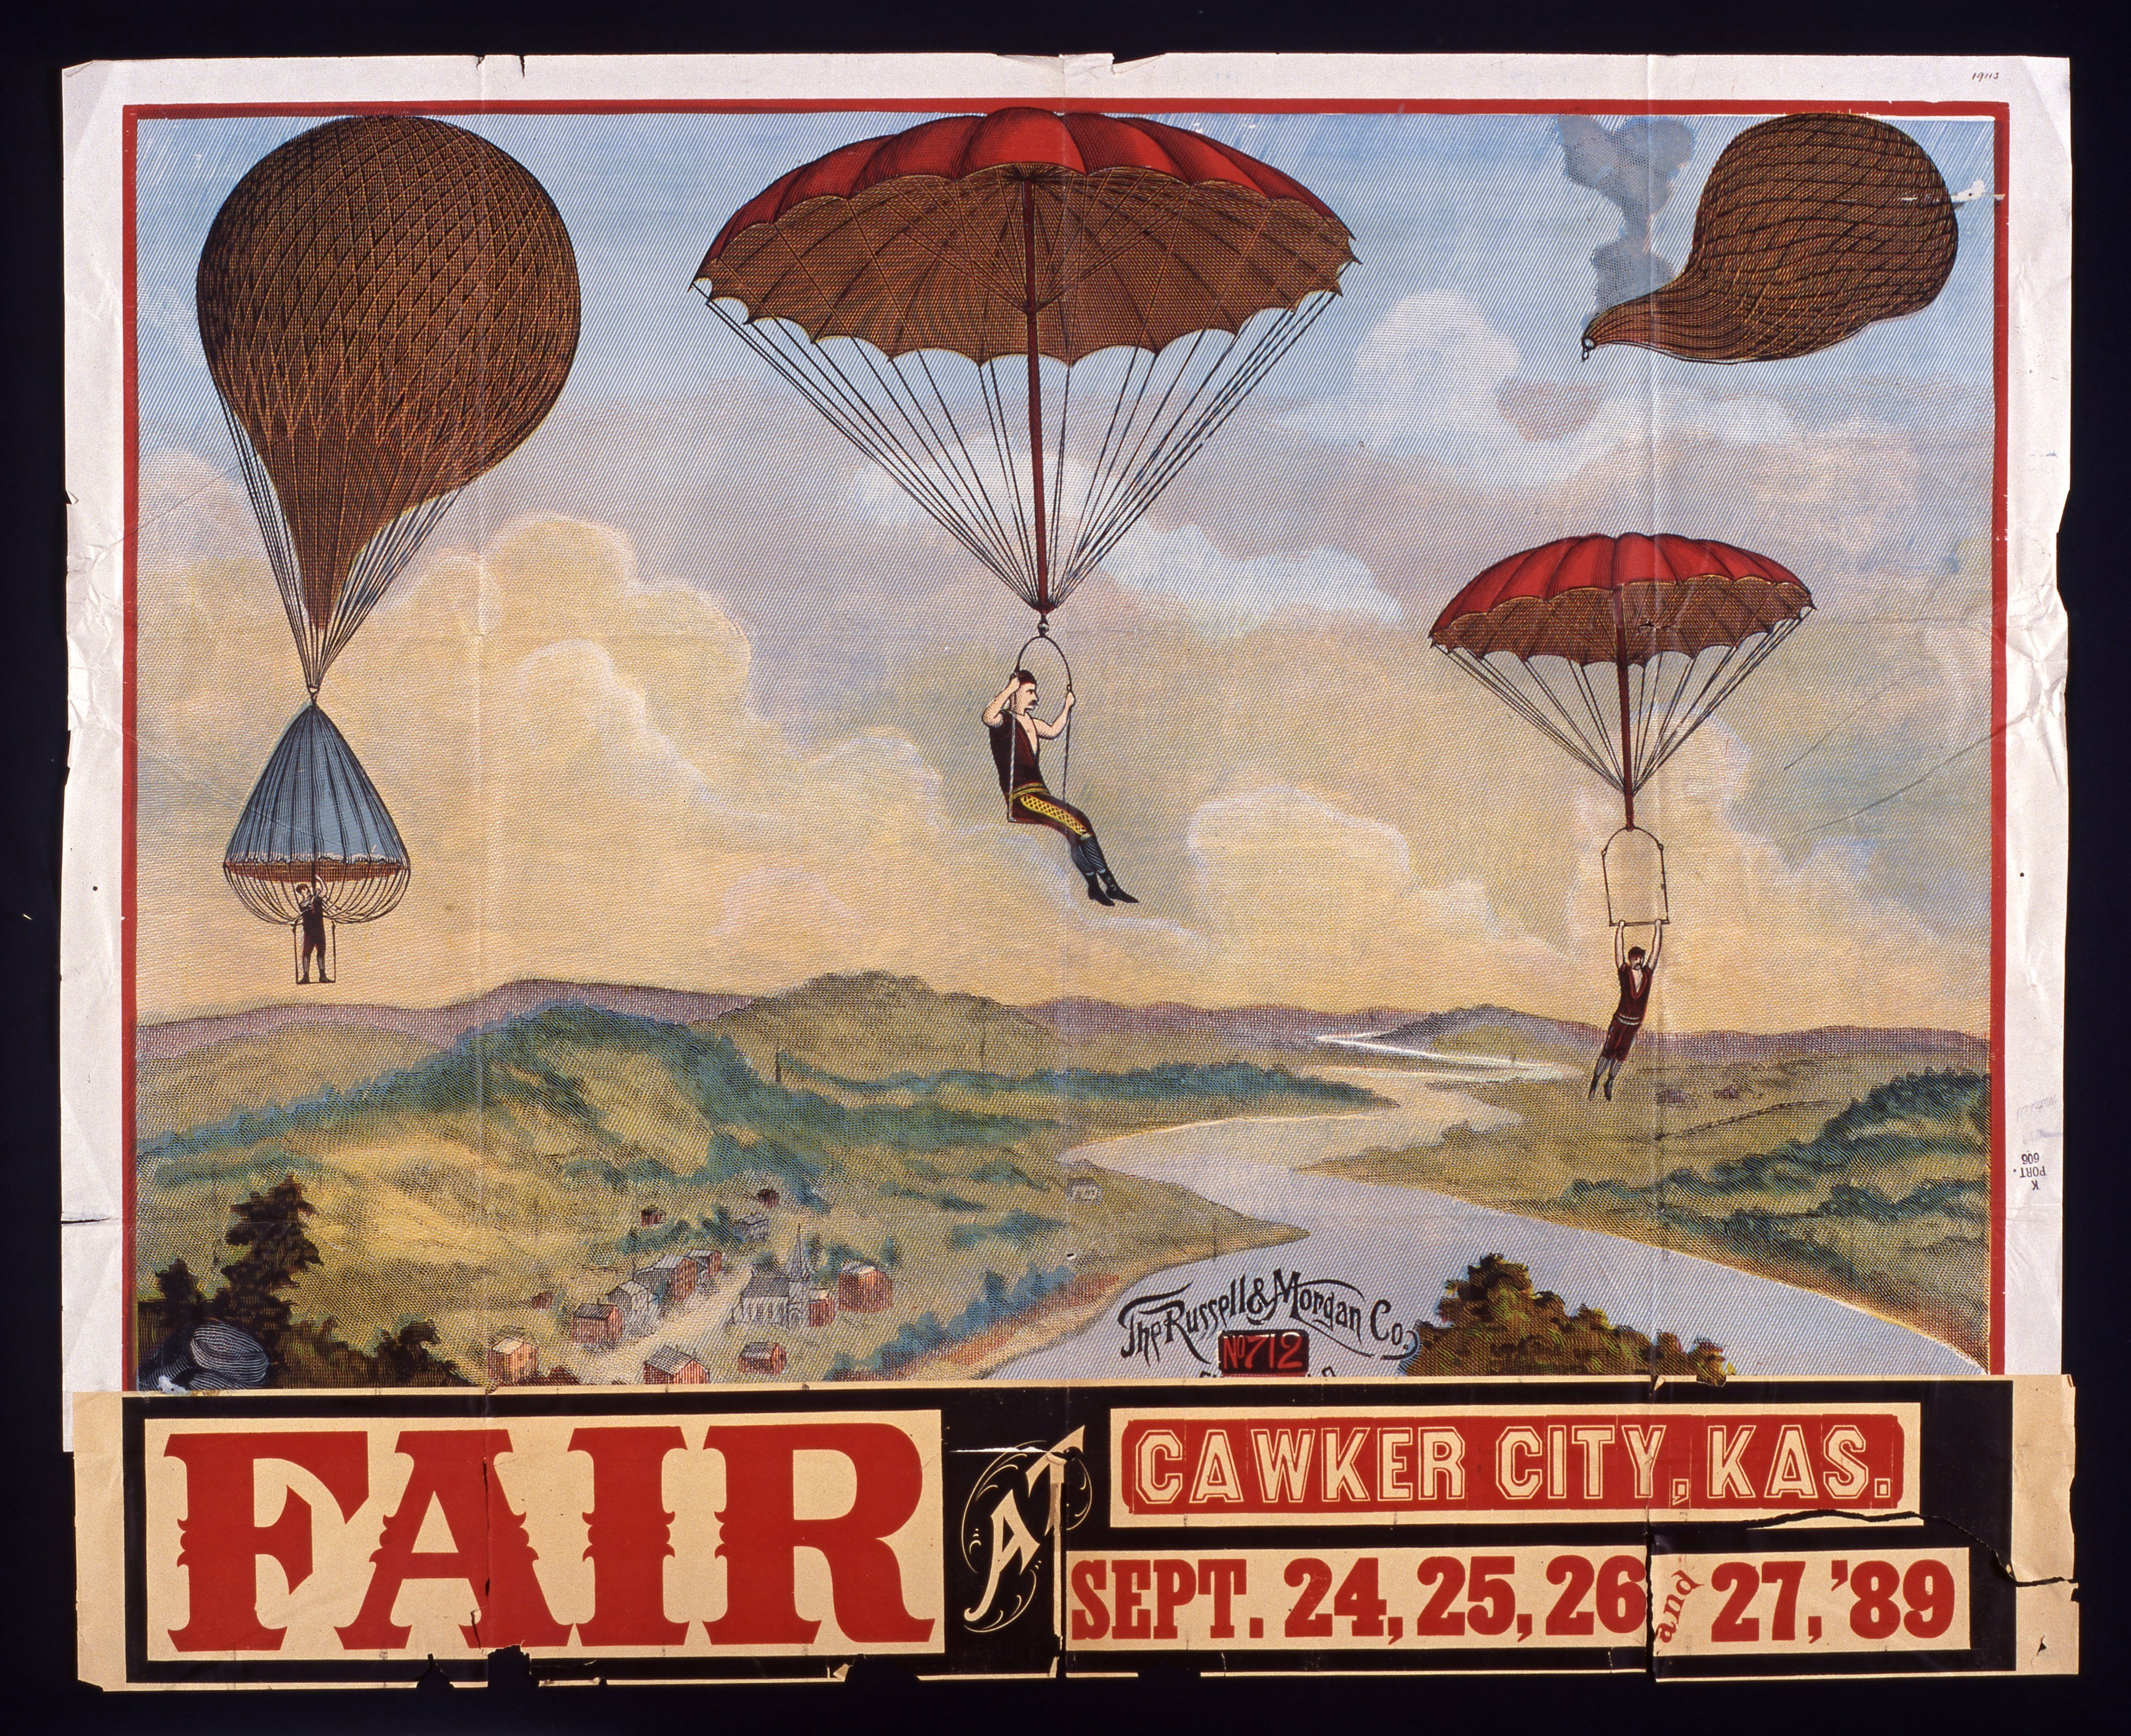 Fair at Cawker City, Kansas